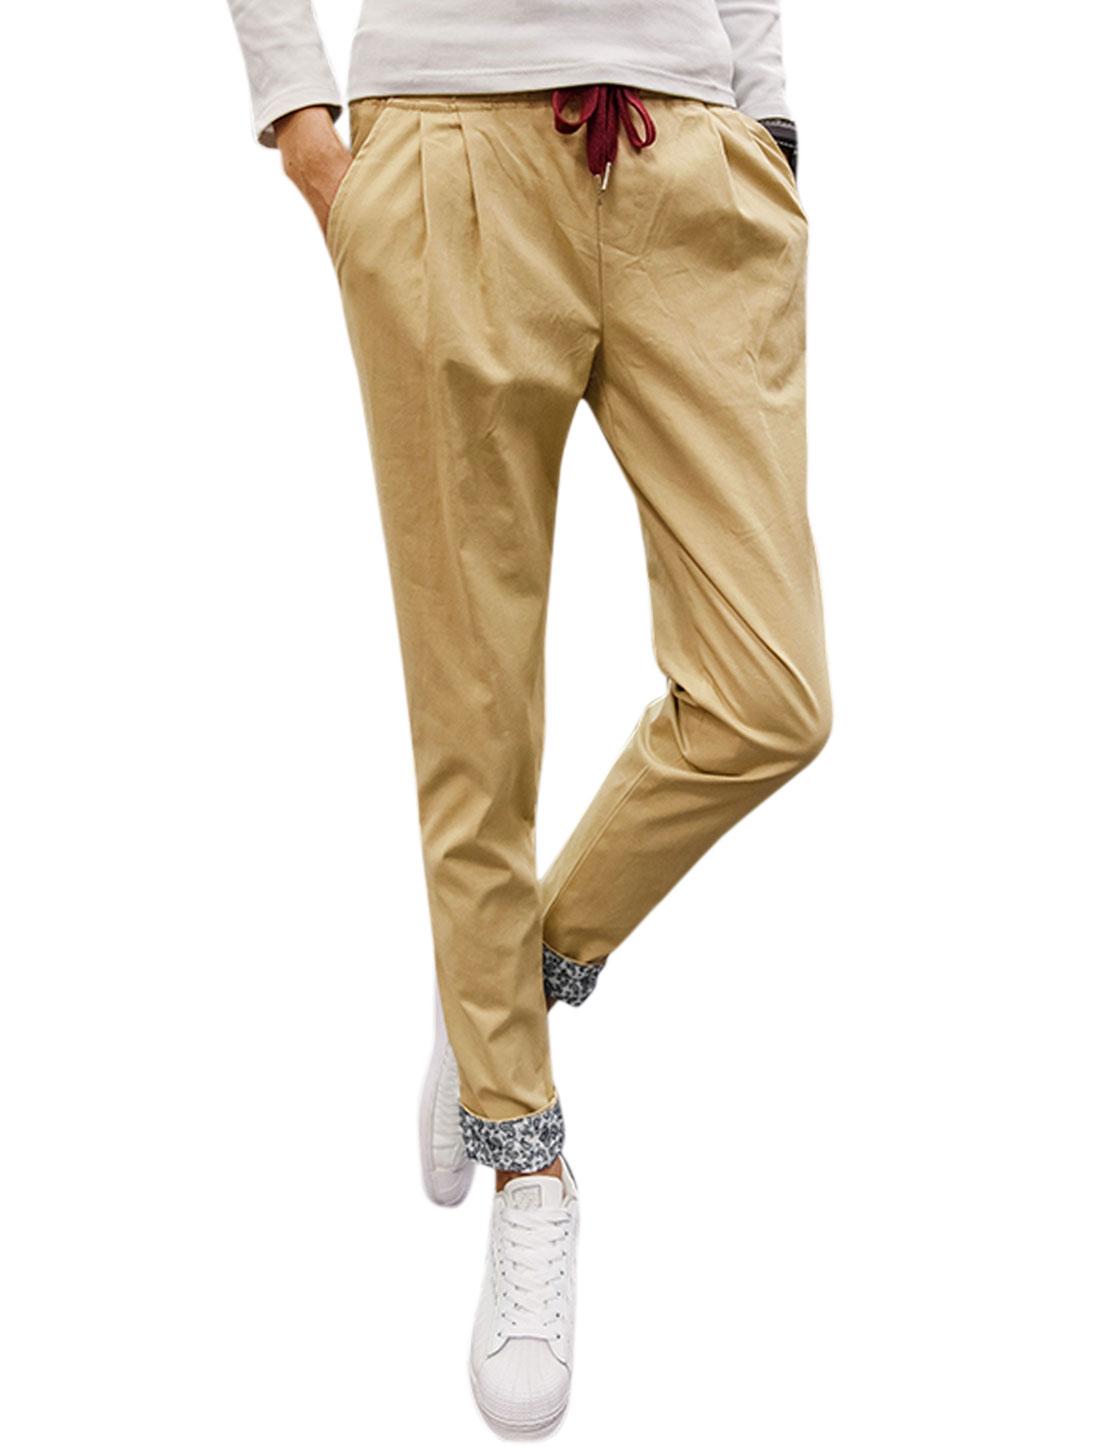 Men Side Pockets Tapered Slim Fit Elastic Drawstring Trousers Beige W34